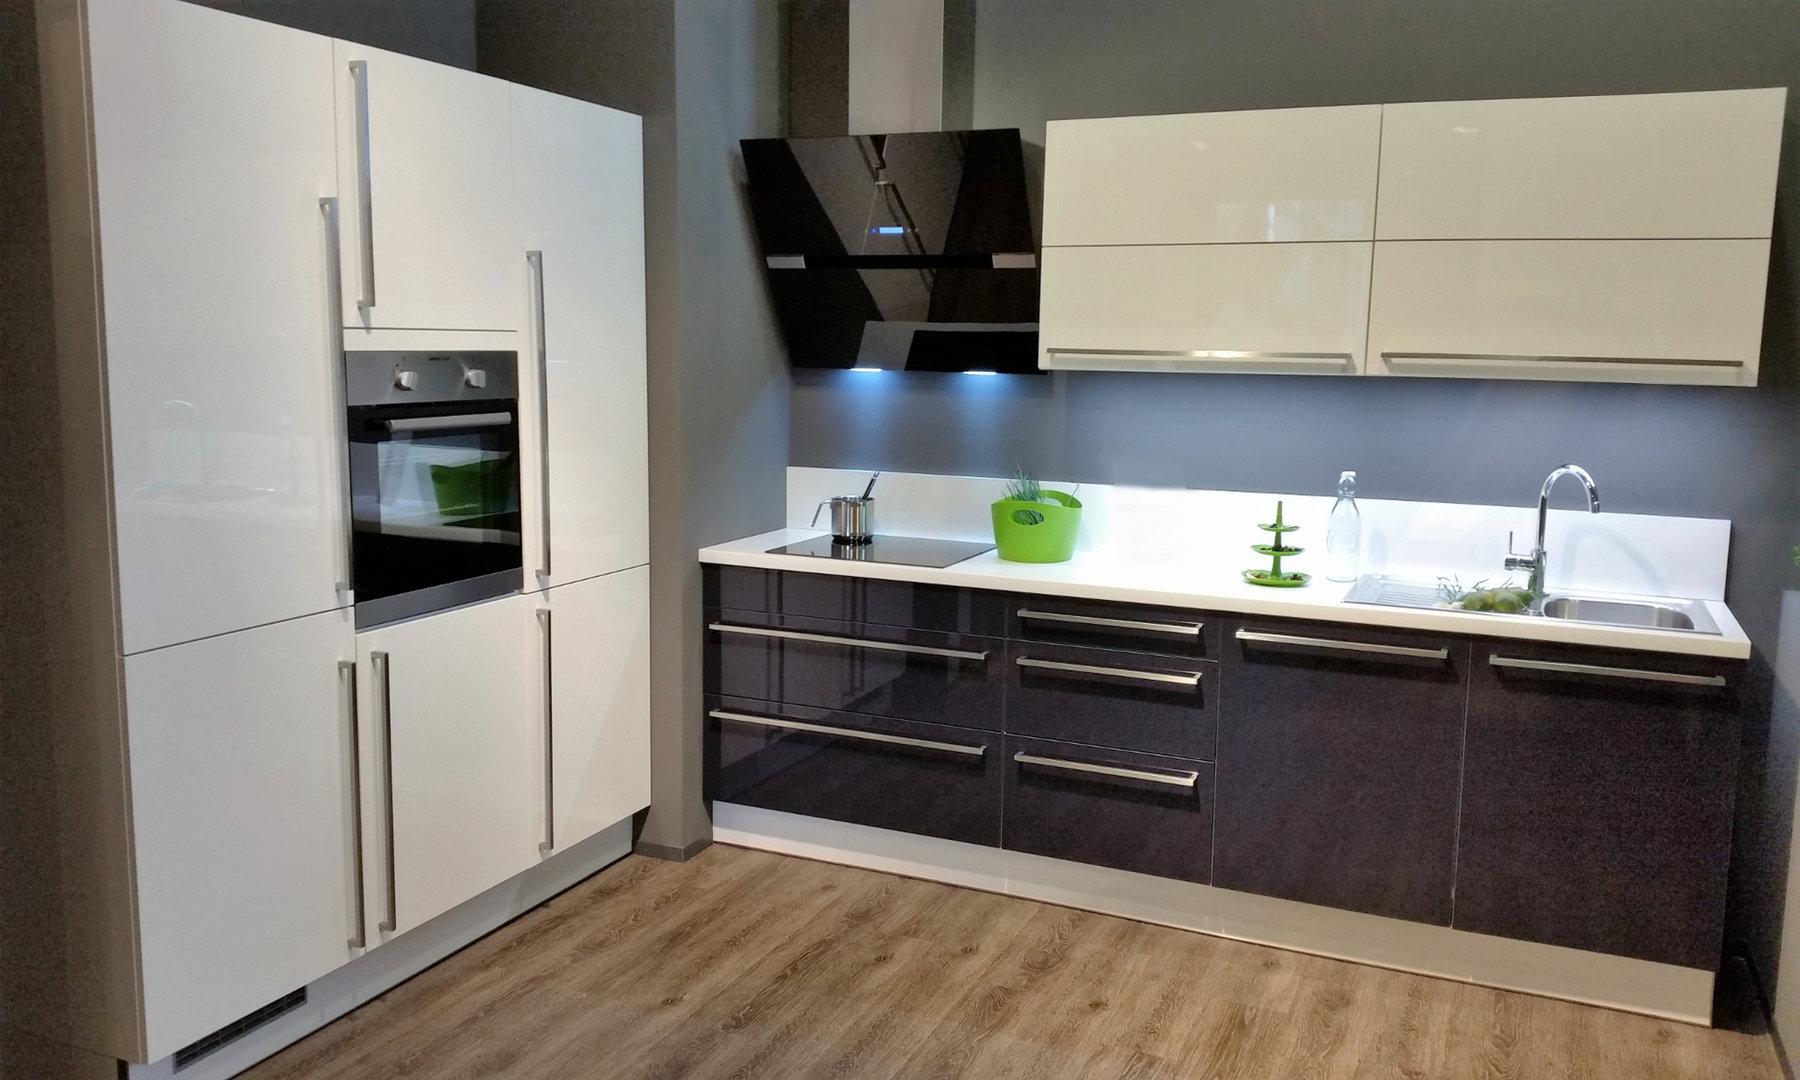 Full Size of Küche Ohne Elektrogeräte Günstig Küche Ohne Elektrogeräte Kaufen Sinnvoll Ikea Küche Ohne Elektrogeräte Was Kostet Eine Küche Ohne Elektrogeräte Küche Küche Ohne Elektrogeräte